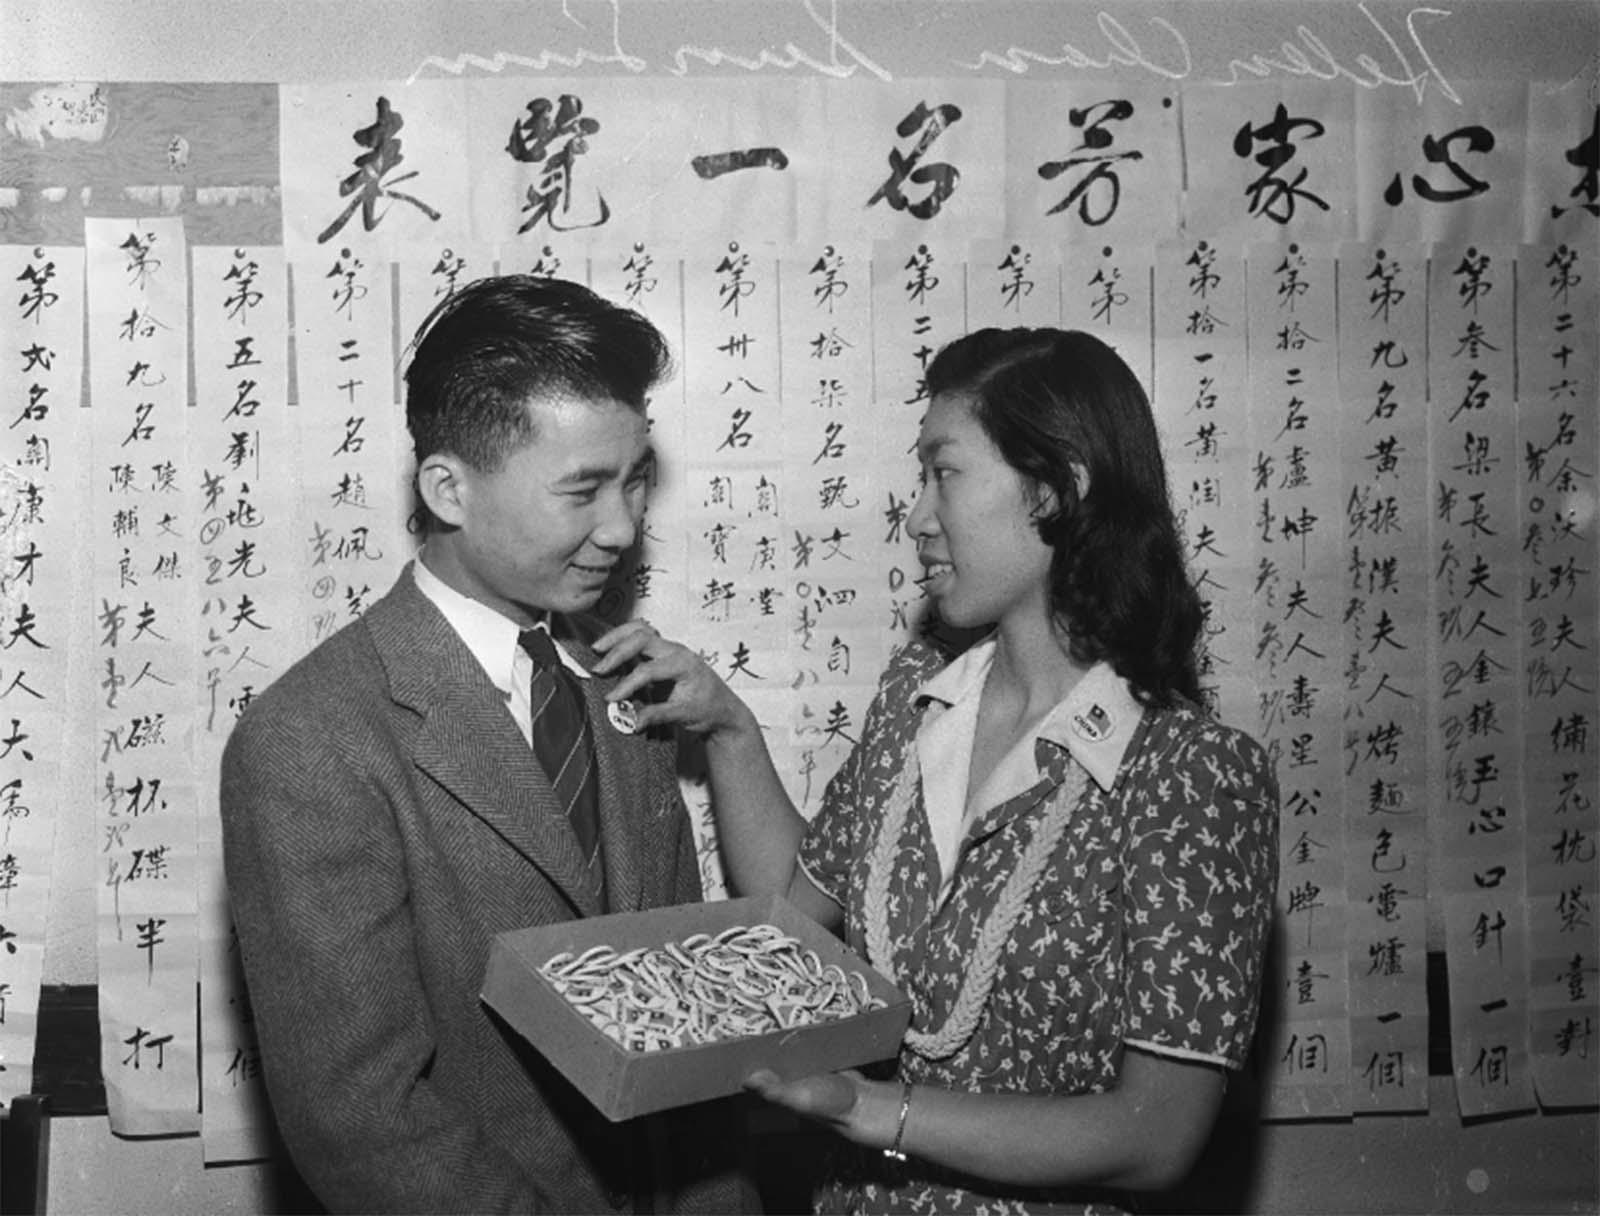 chinese americans on ww2 - 2ª Guerra Mundial: Americanos chineses se rotulam para evitar serem confundidos com japoneses